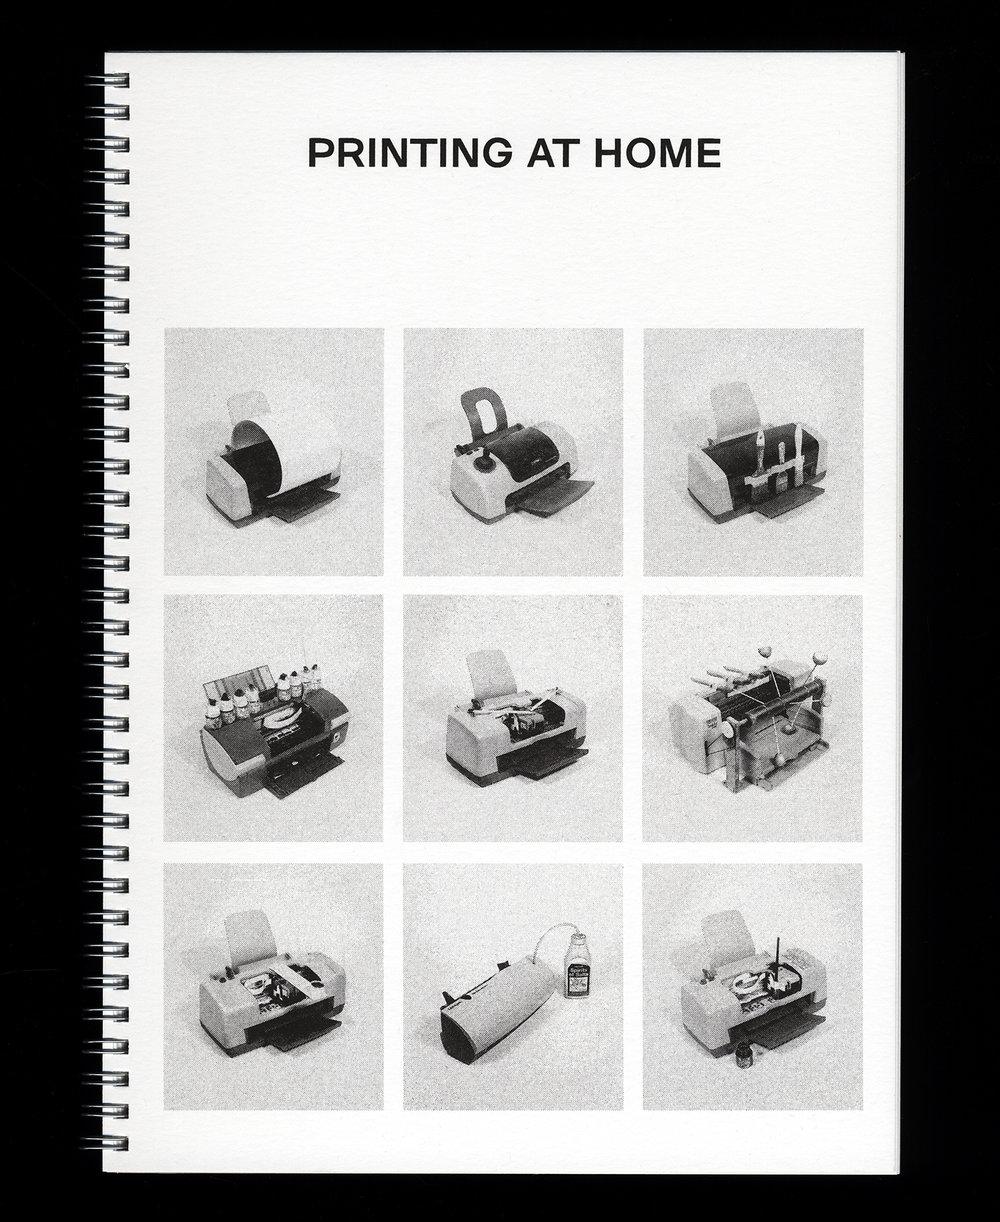 printingathome-1.jpg